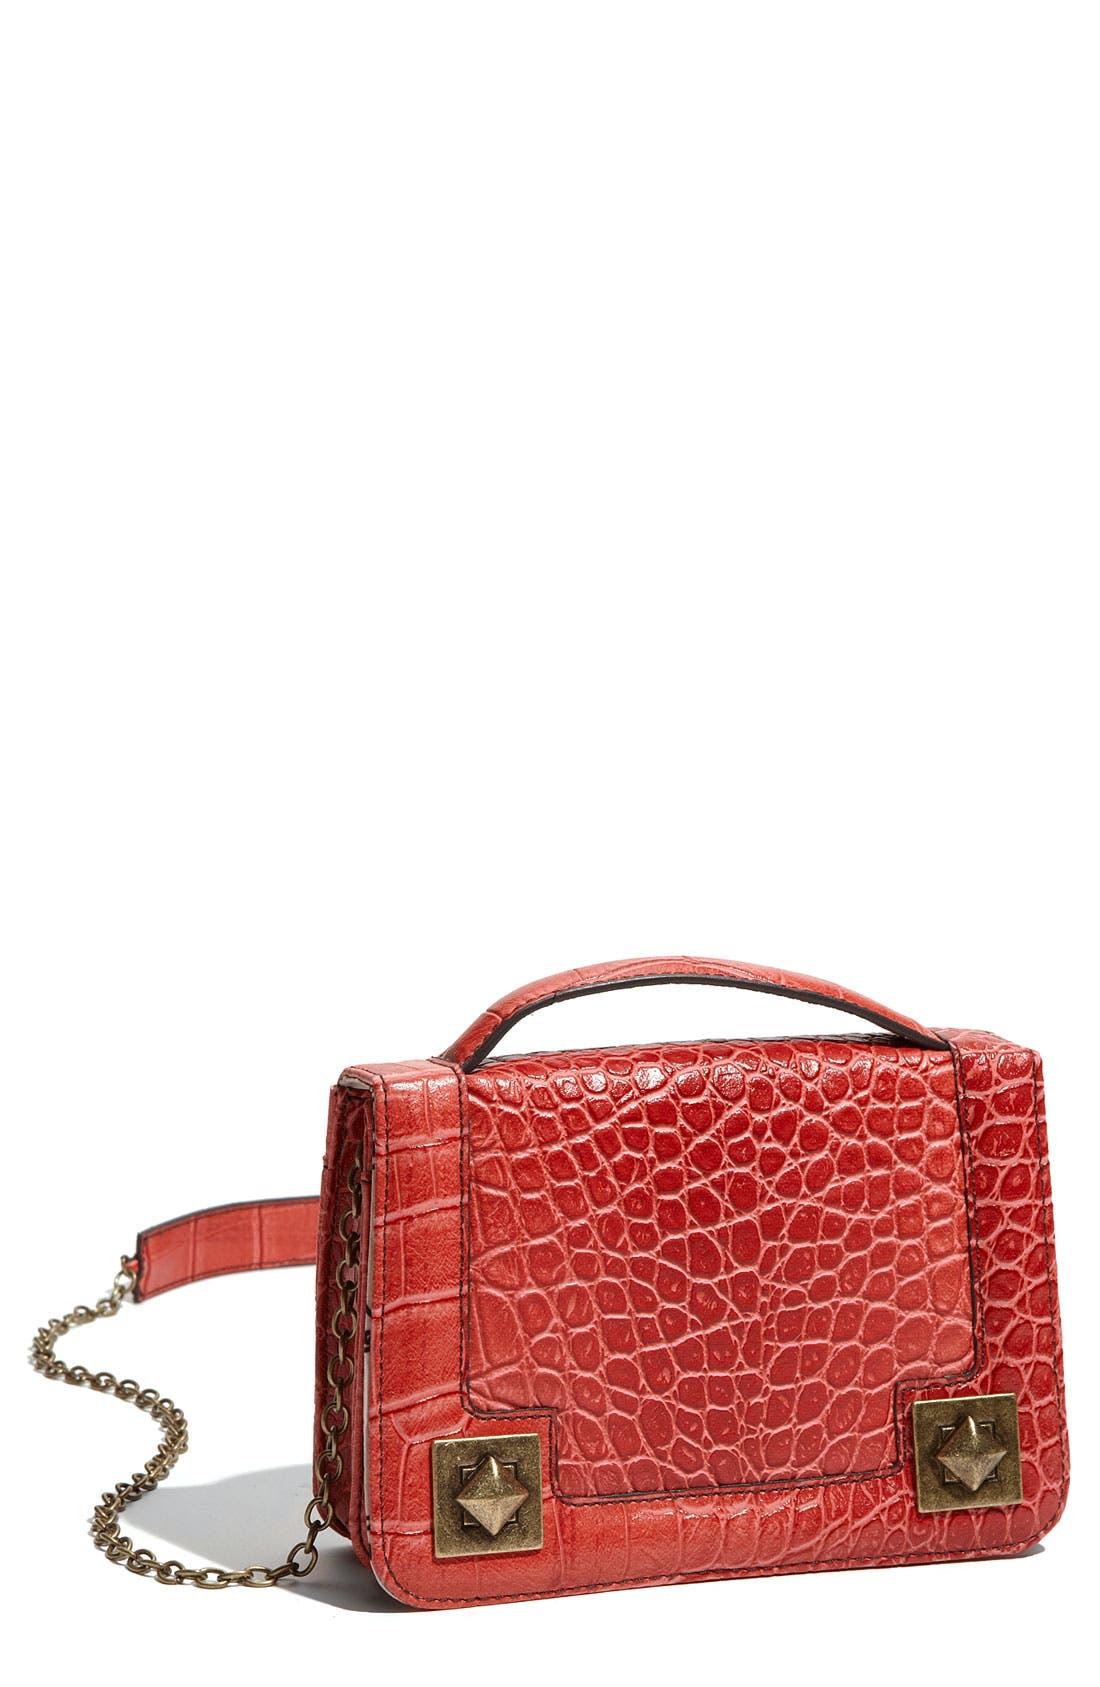 Alternate Image 1 Selected - Jessica Simpson 'Bella' Faux Leather Crossbody Bag